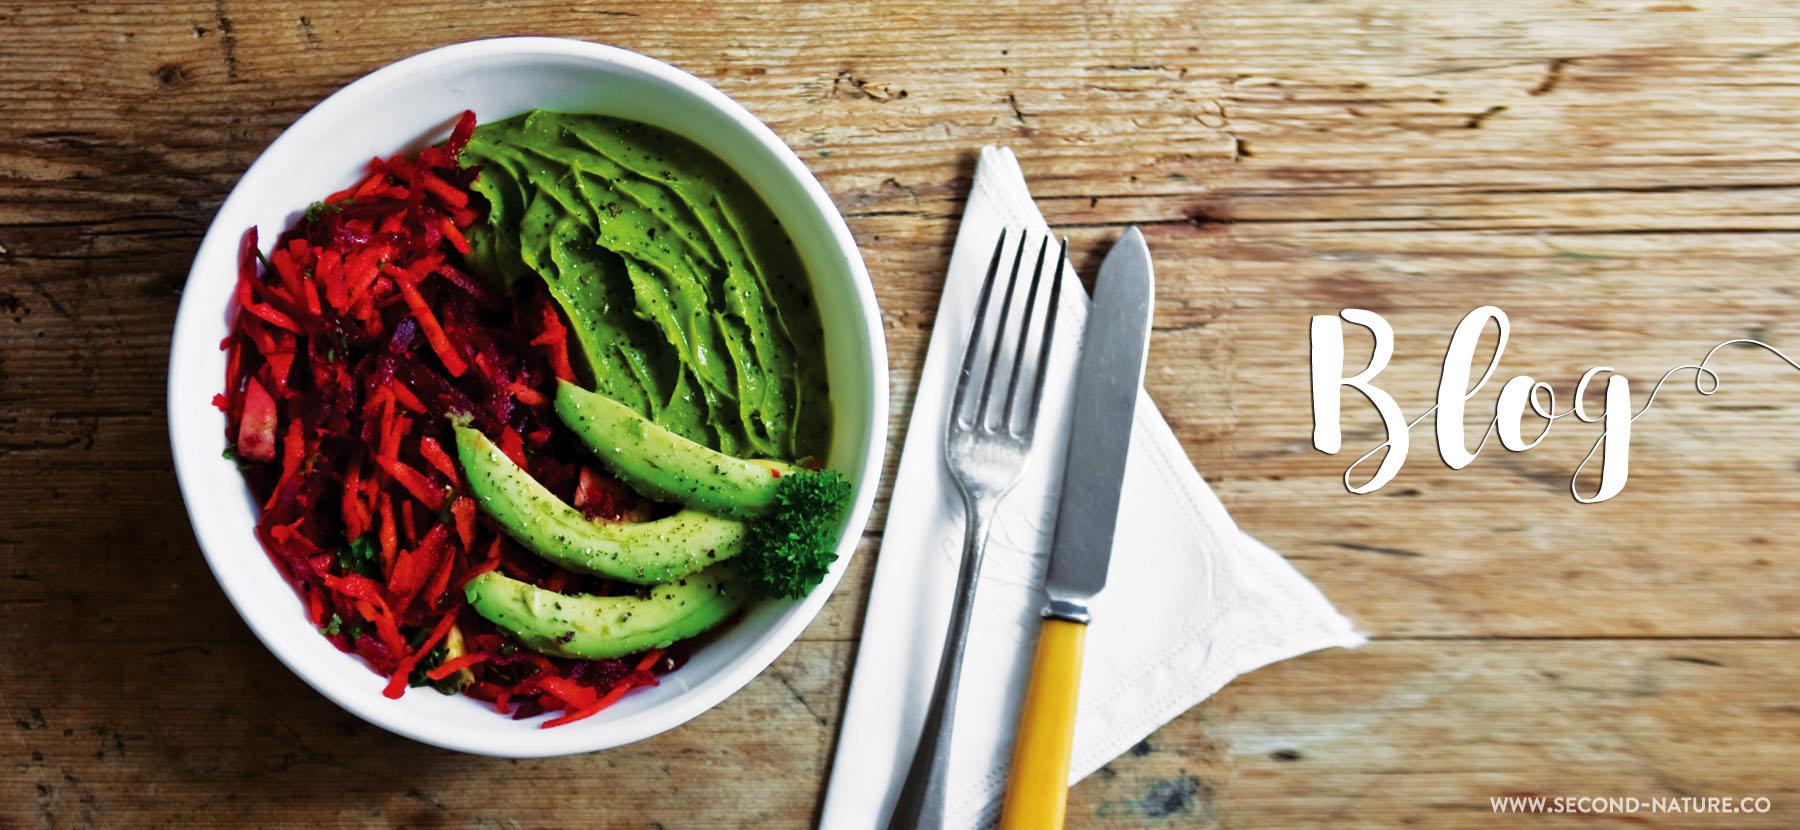 healthy-recipes-blog-second-nature